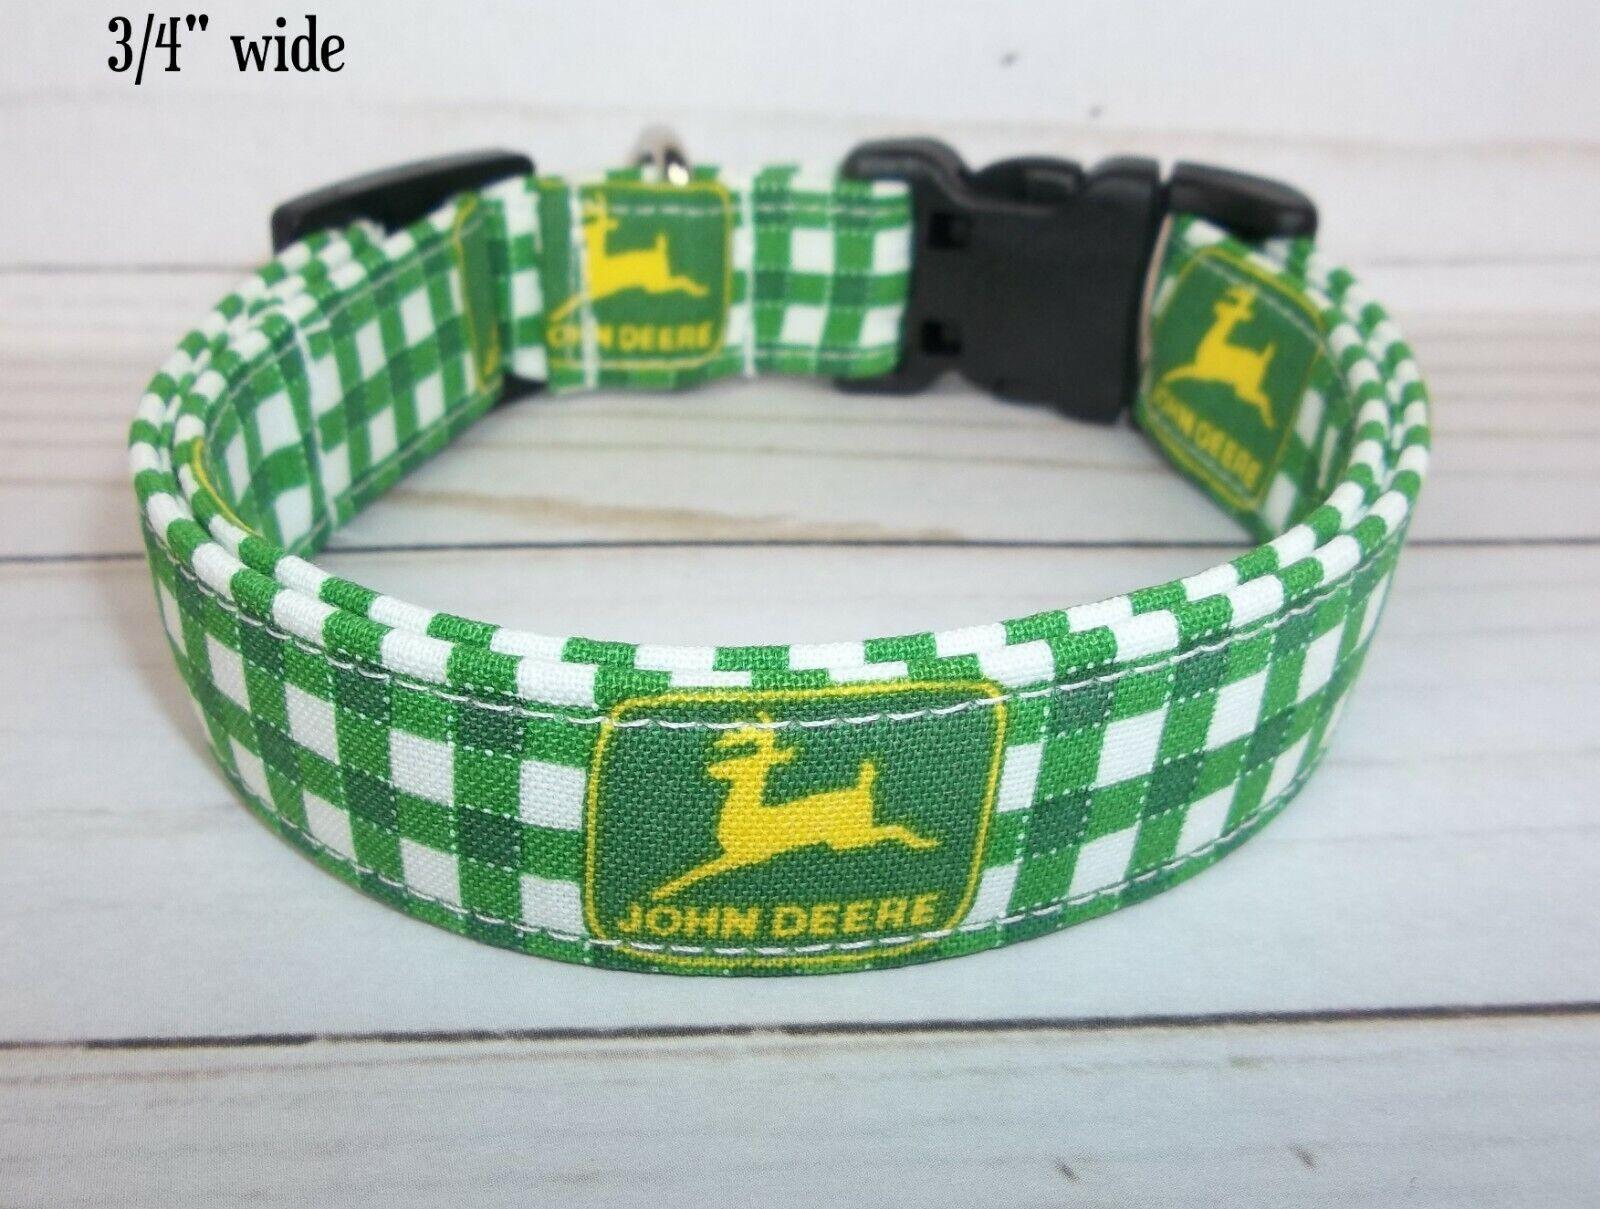 Green White Check Terri's Dog Collar handmade with John Deer